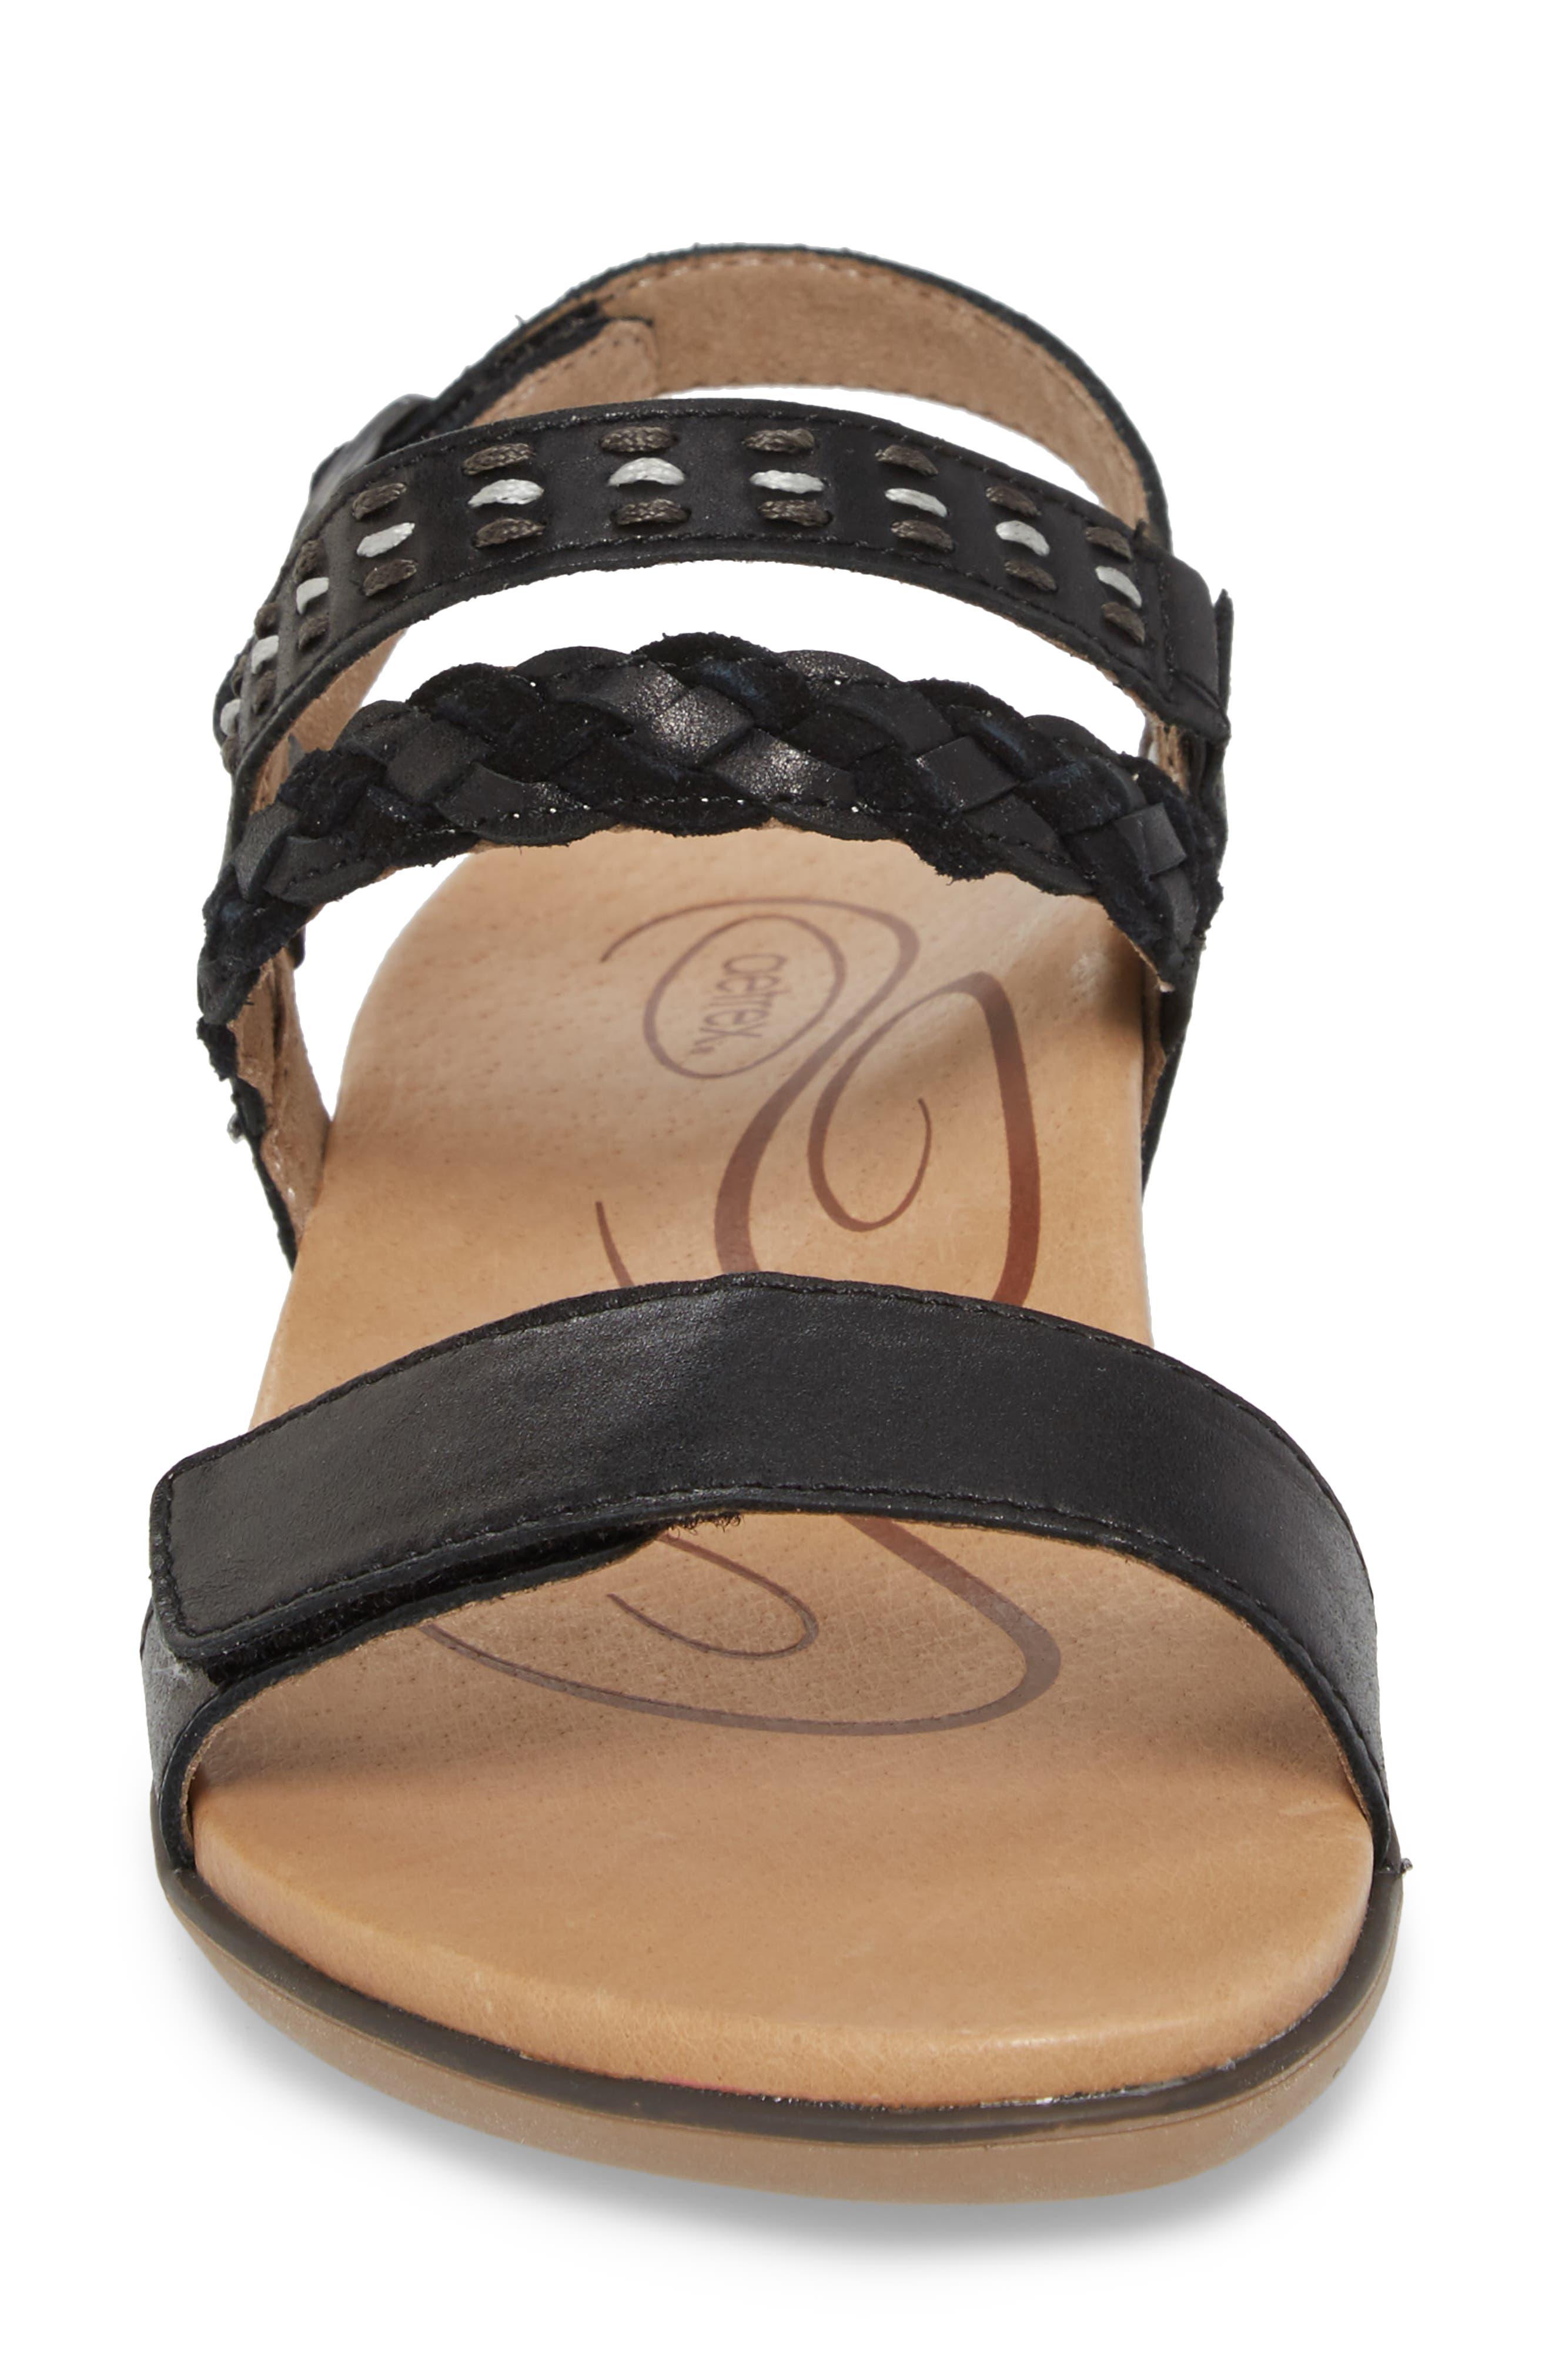 Celeste Sandal,                             Alternate thumbnail 4, color,                             Black Leather